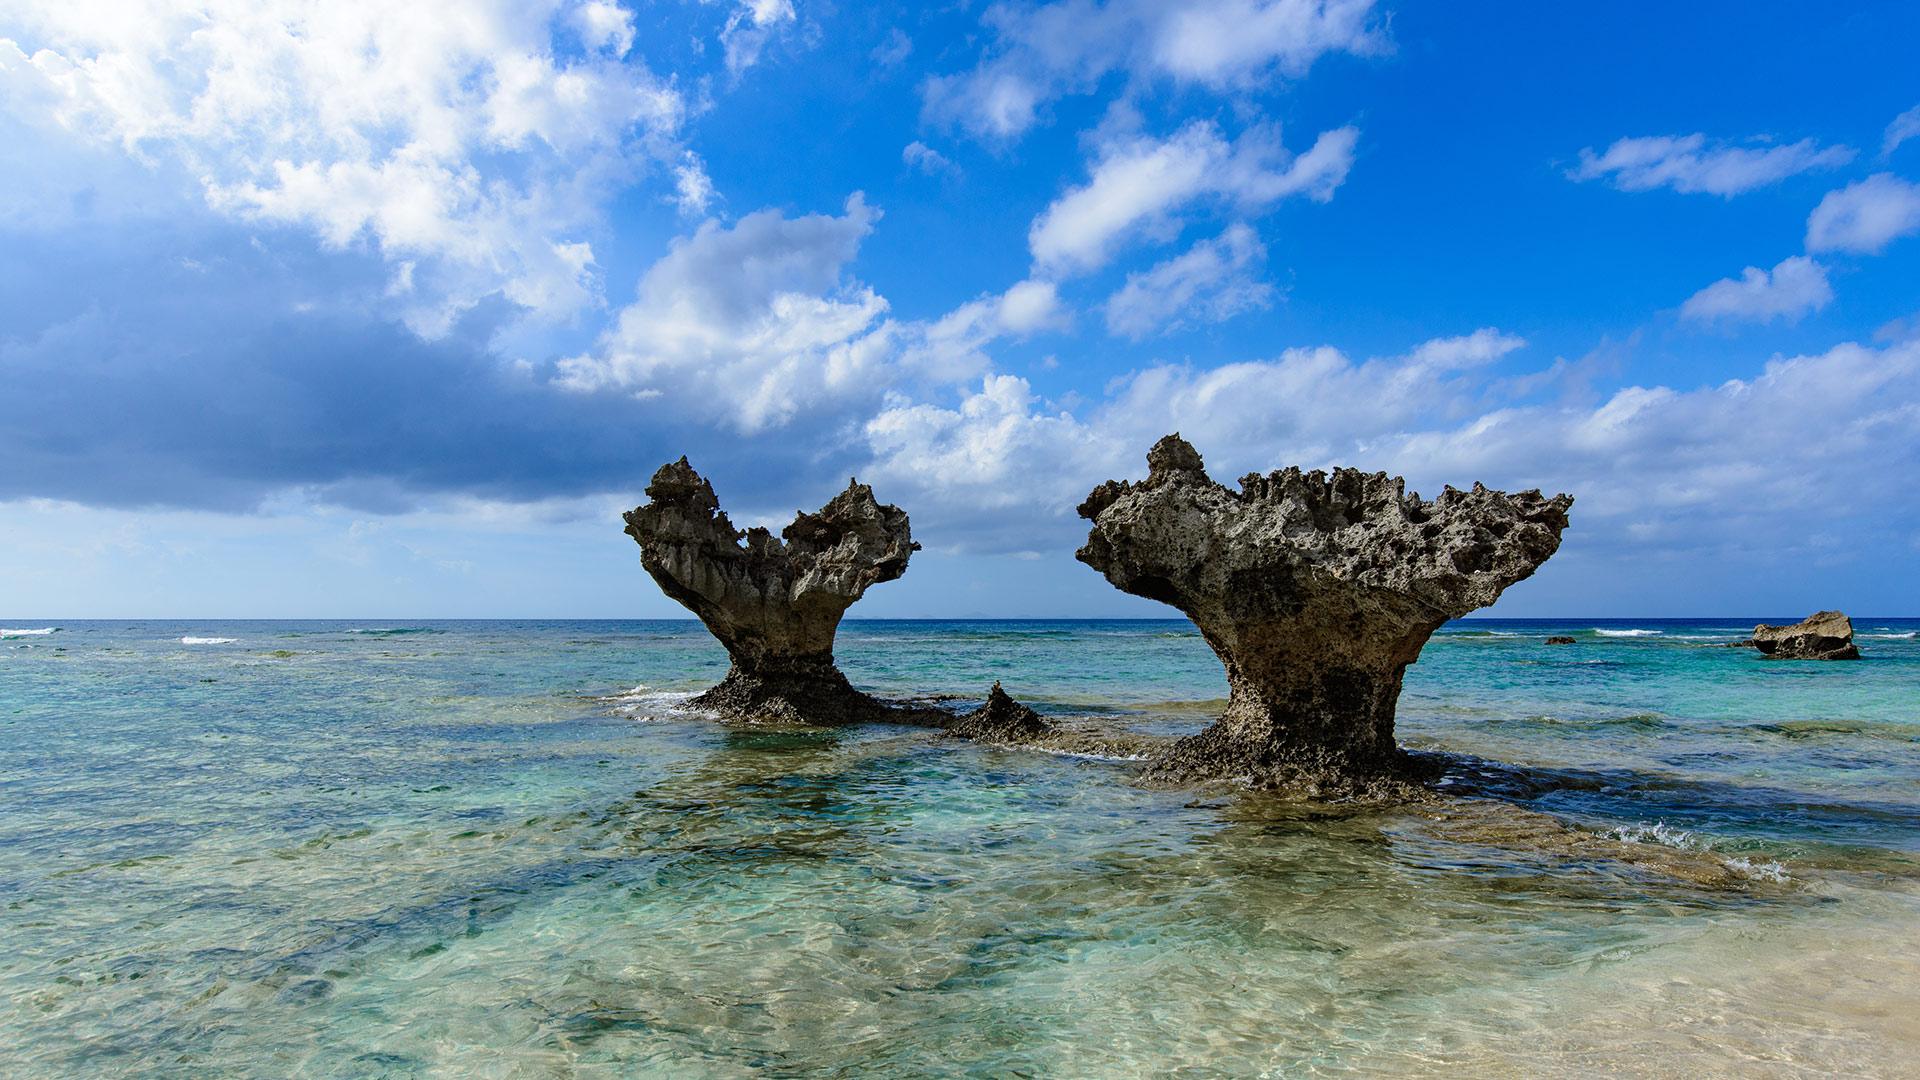 沖縄本島中部・北部Hip-Hop Bus1日ツアー:古宇利島、美ら海水族館、ブセナ海中公園...